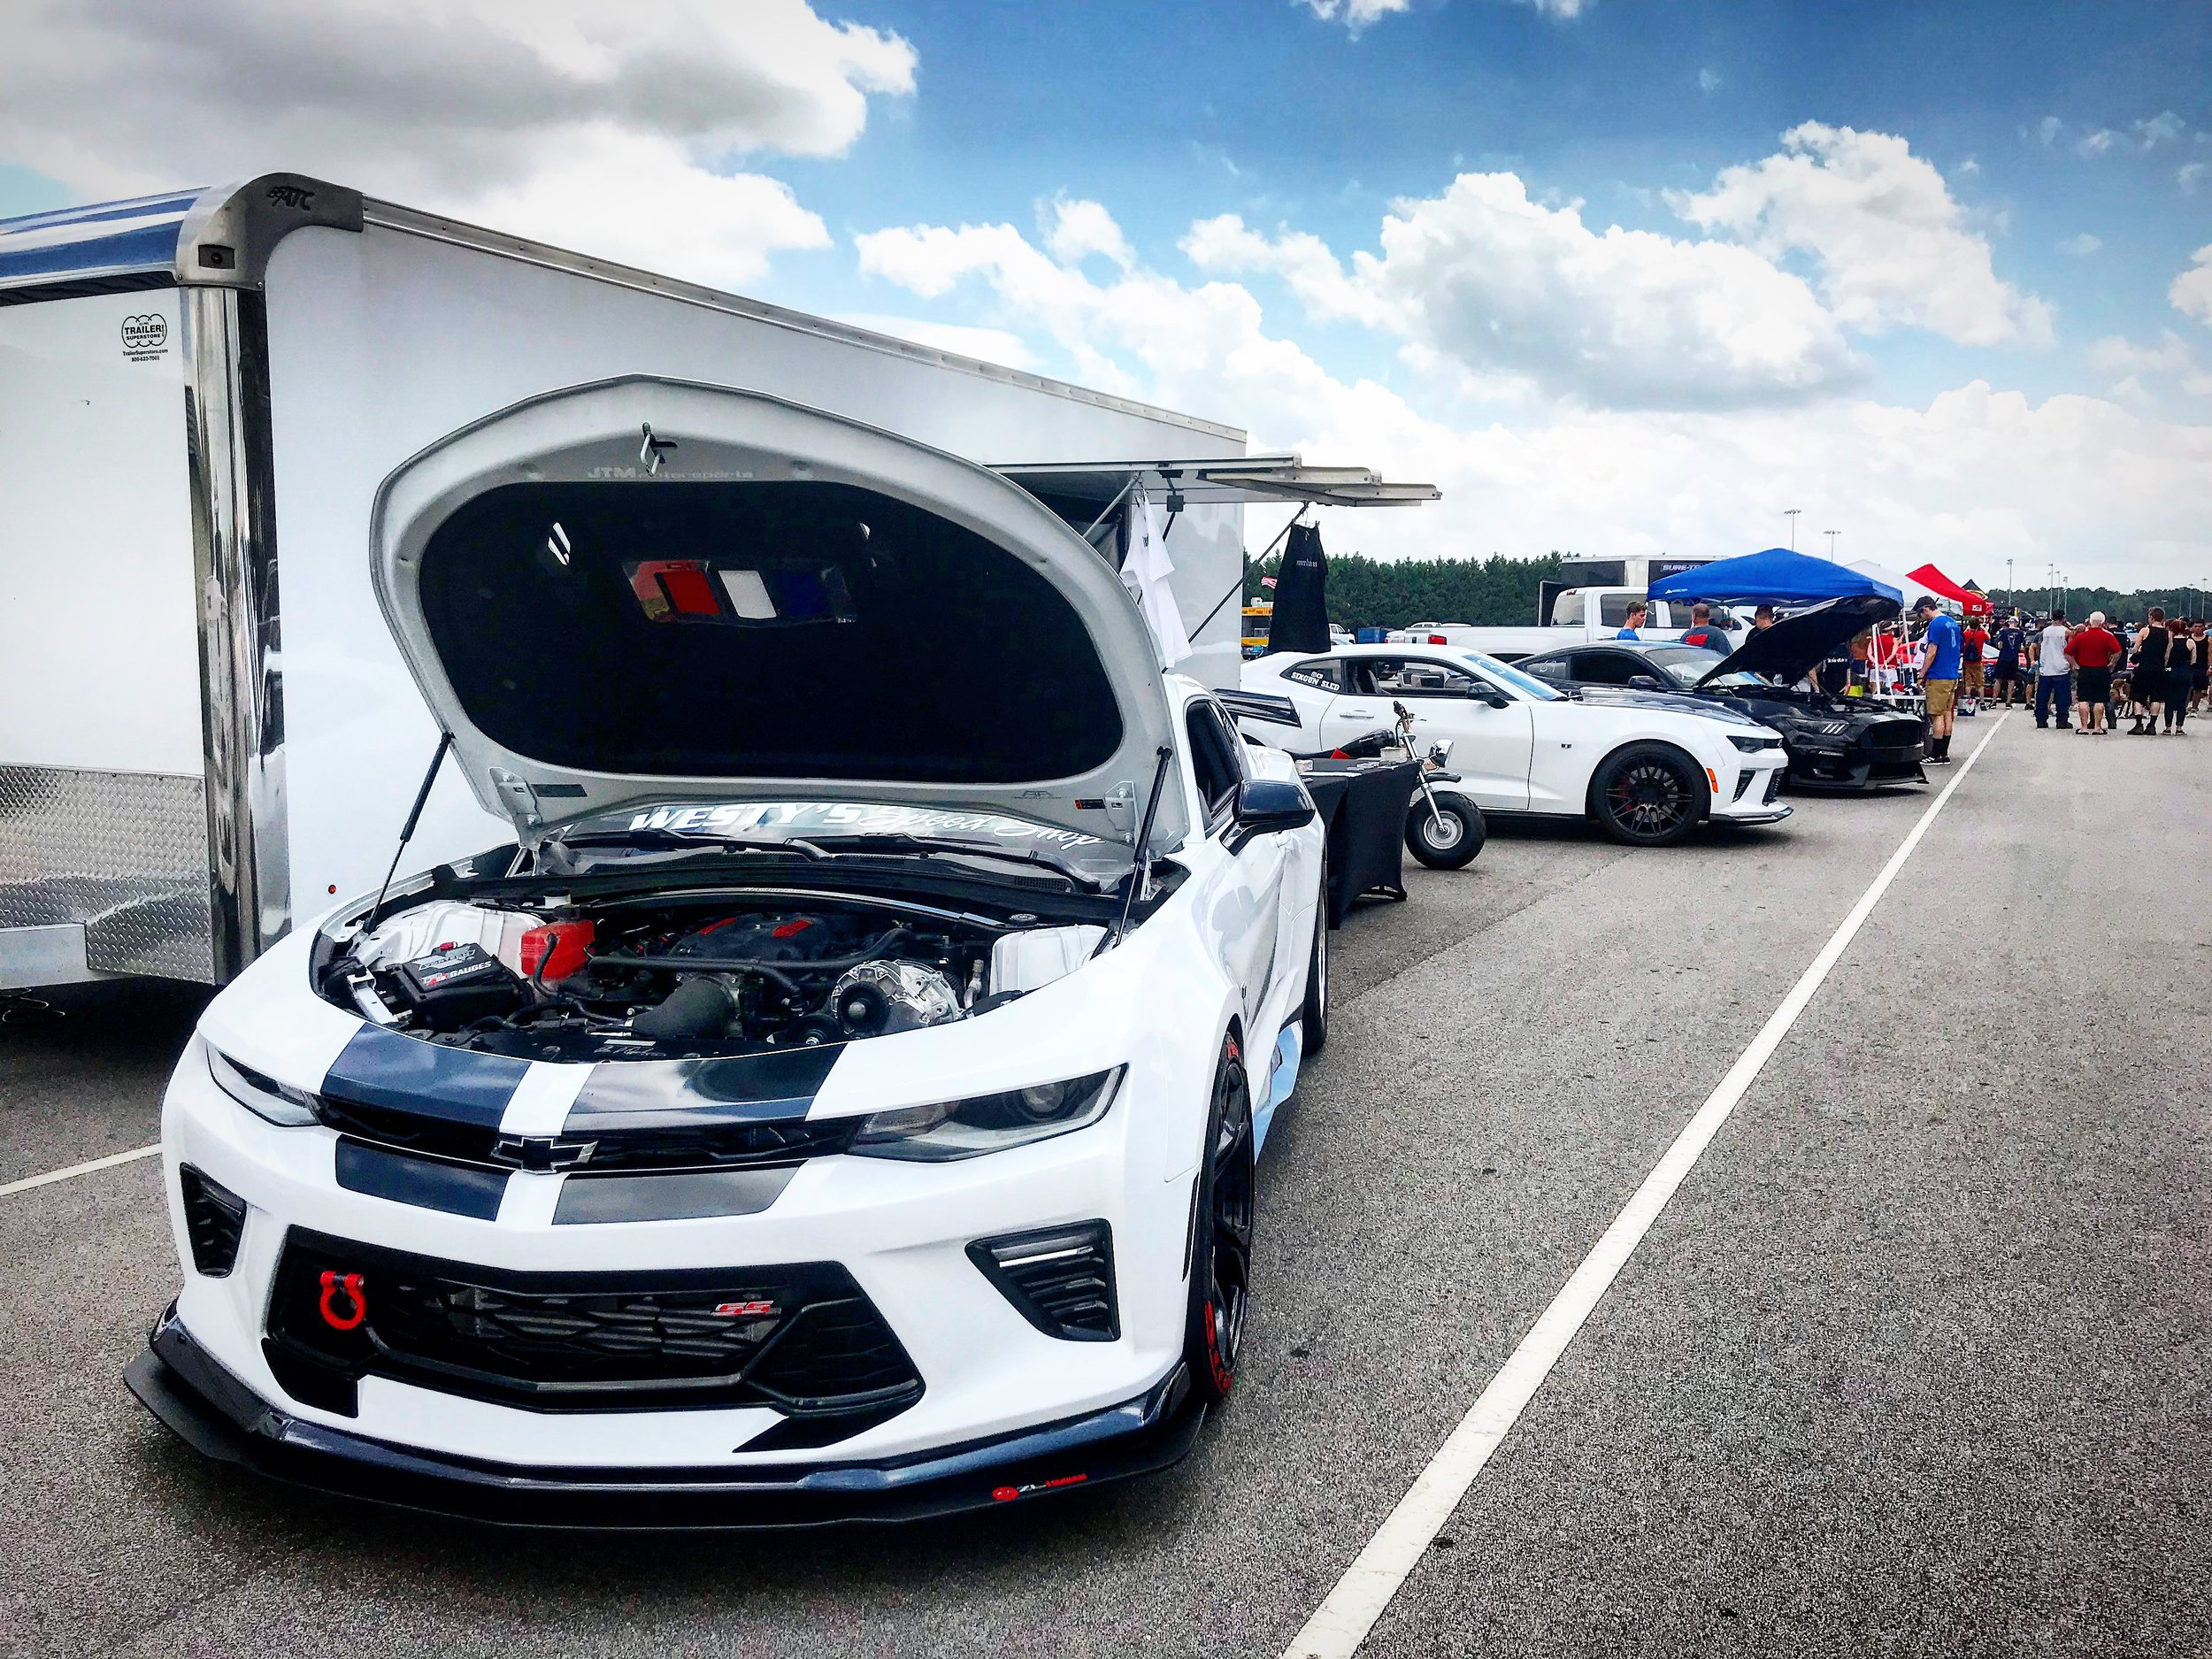 Gallot Motorsports Park NC 2018